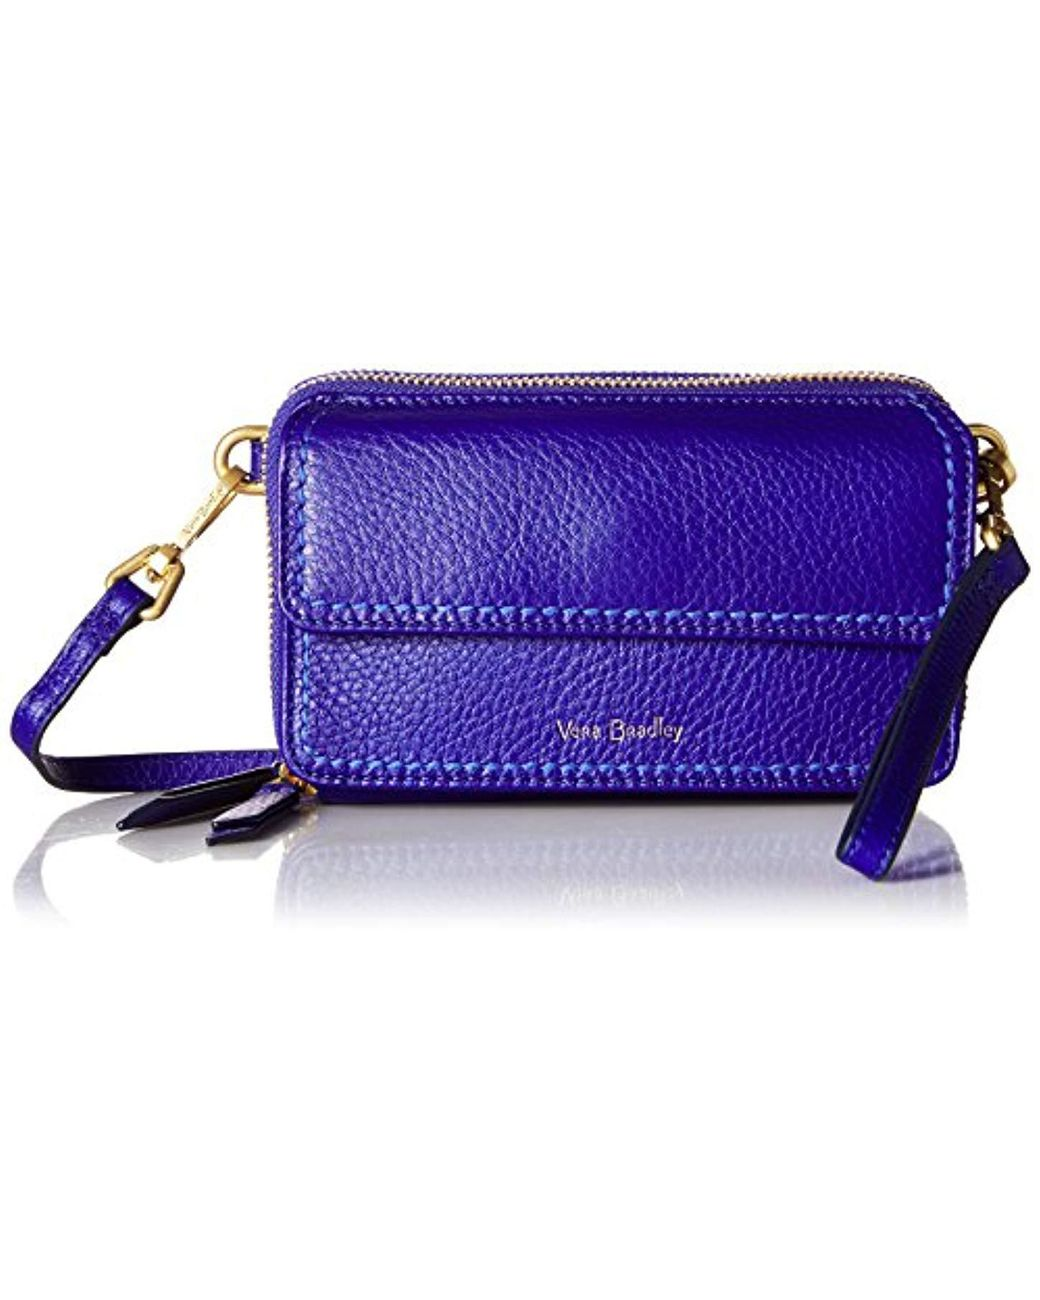 f7cfebb8f Vera Bradley Mallory Rfid All In One Crossbody, Leather in Blue - Save 9% -  Lyst